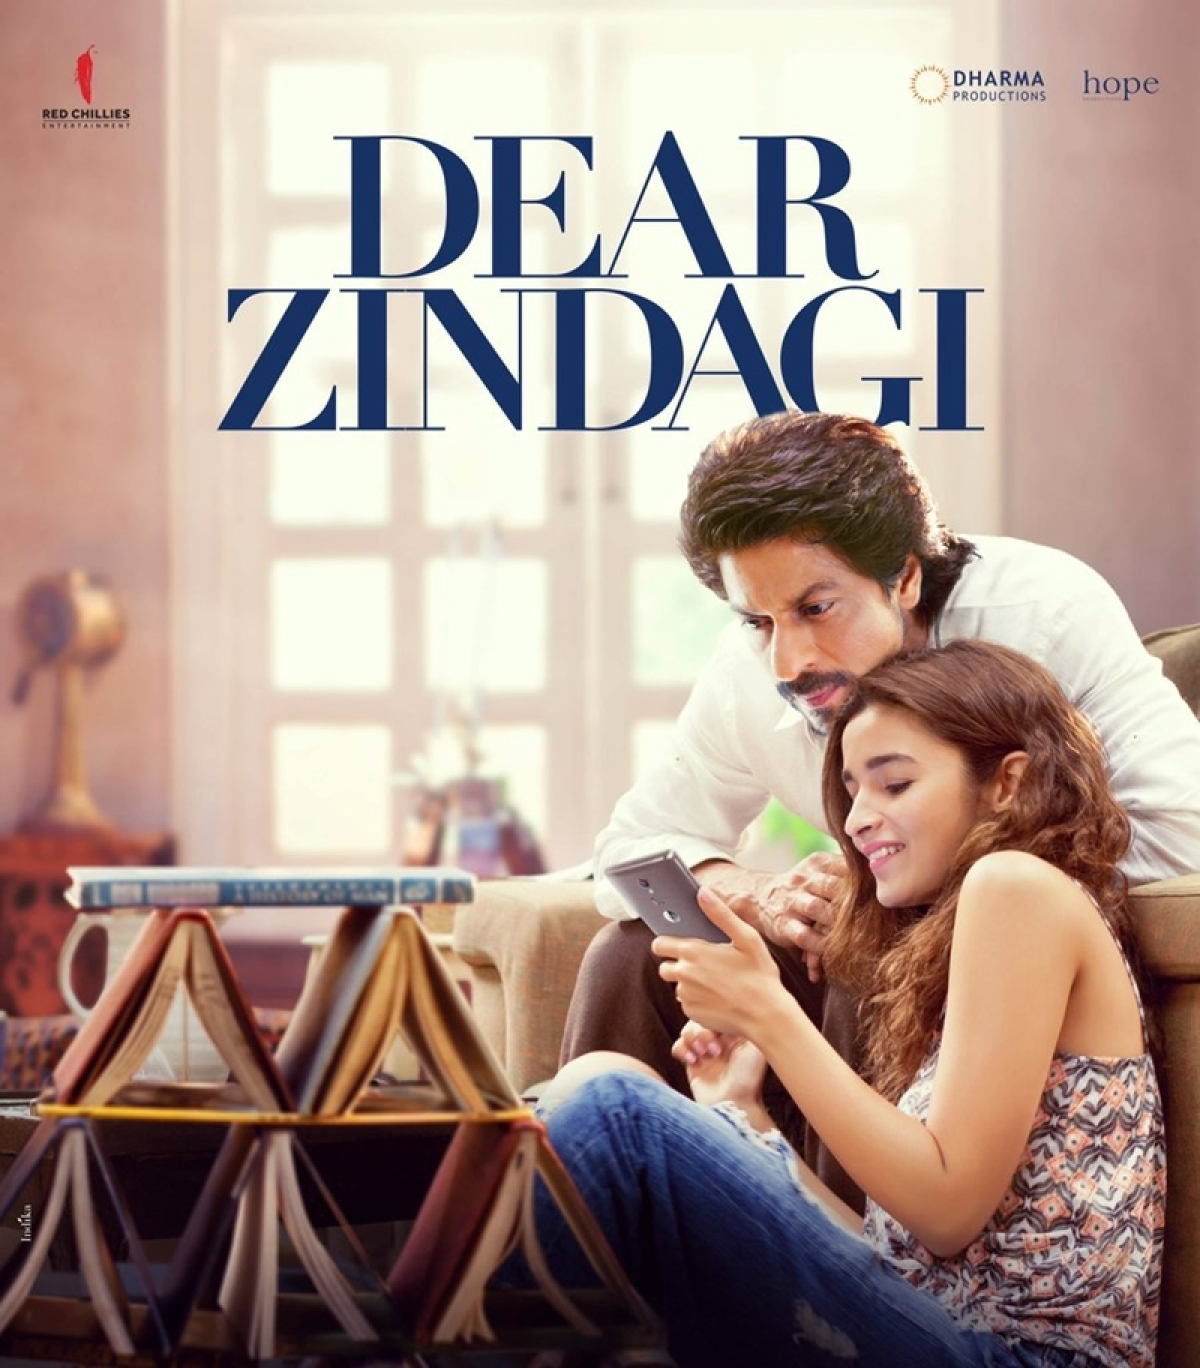 'Dear Zindagi' most popular movie on Google Play in India